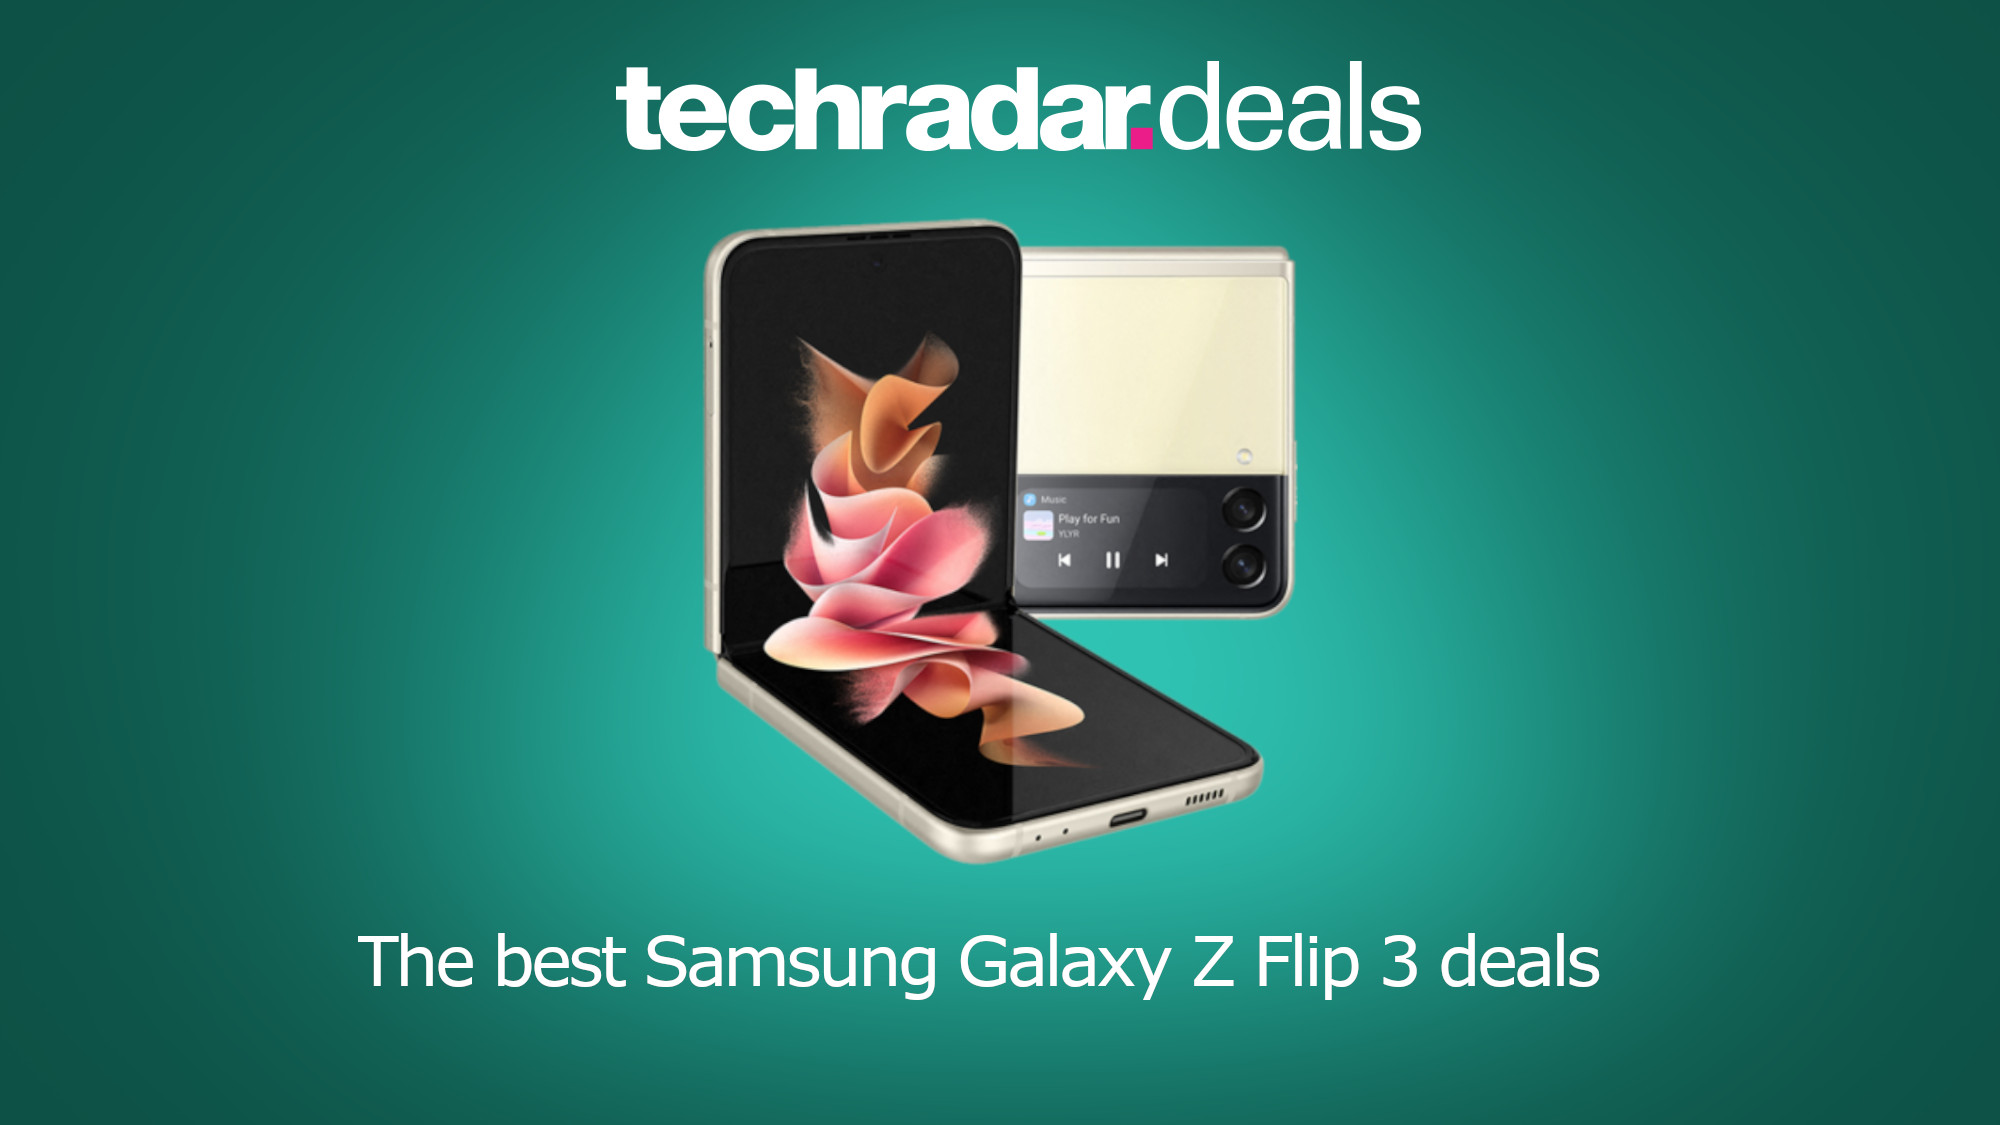 Samsung Galaxy Z Flip 3 deals